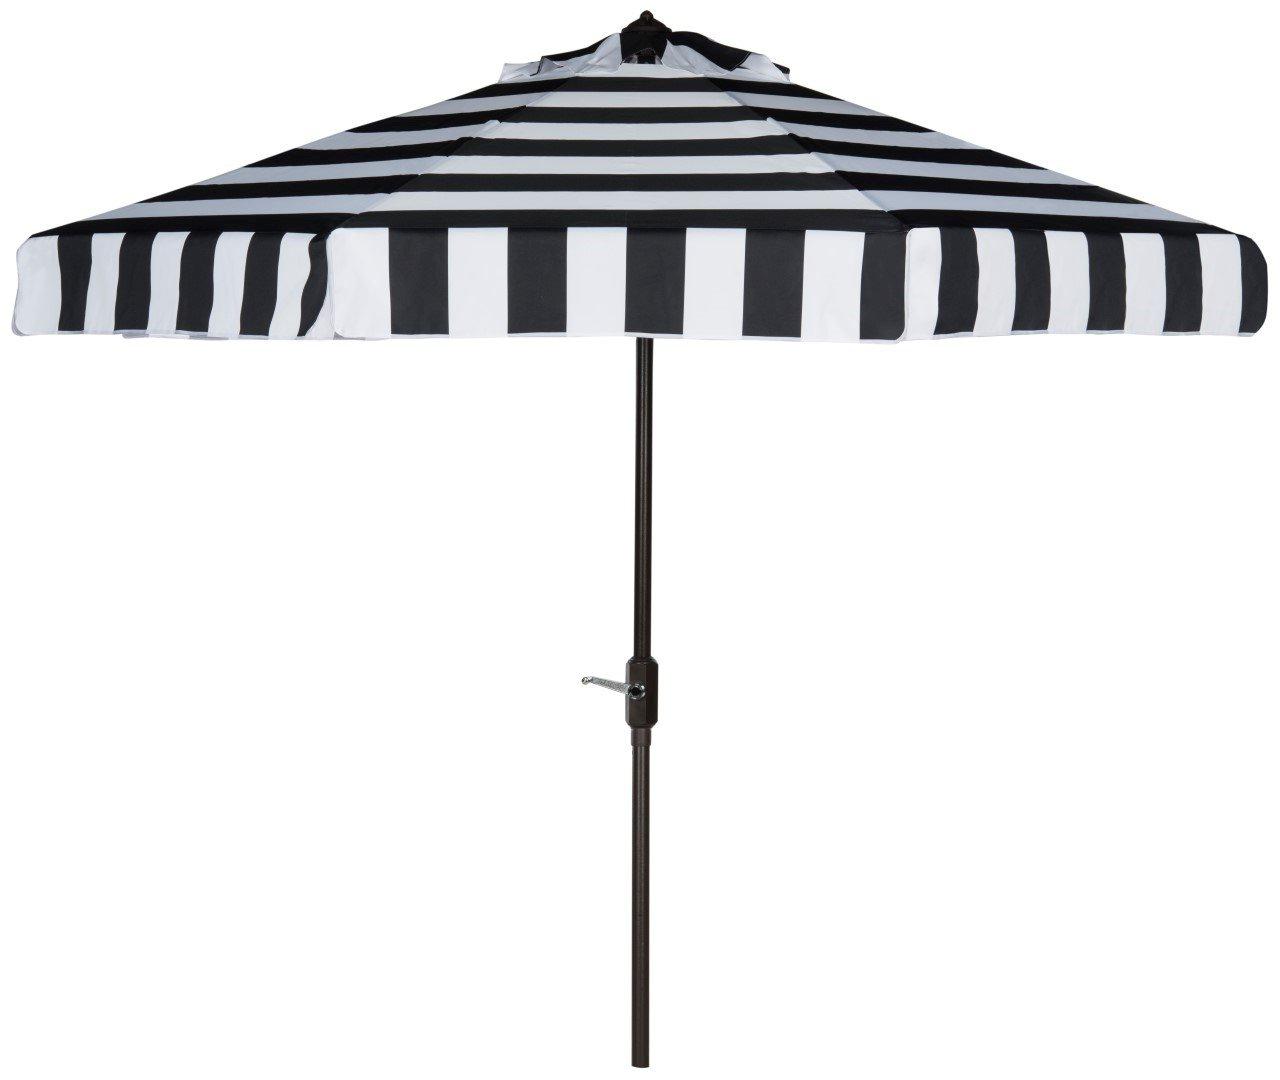 Priscilla Market Umbrellas Within Well Known Seaport 9' Market Umbrella (View 15 of 20)